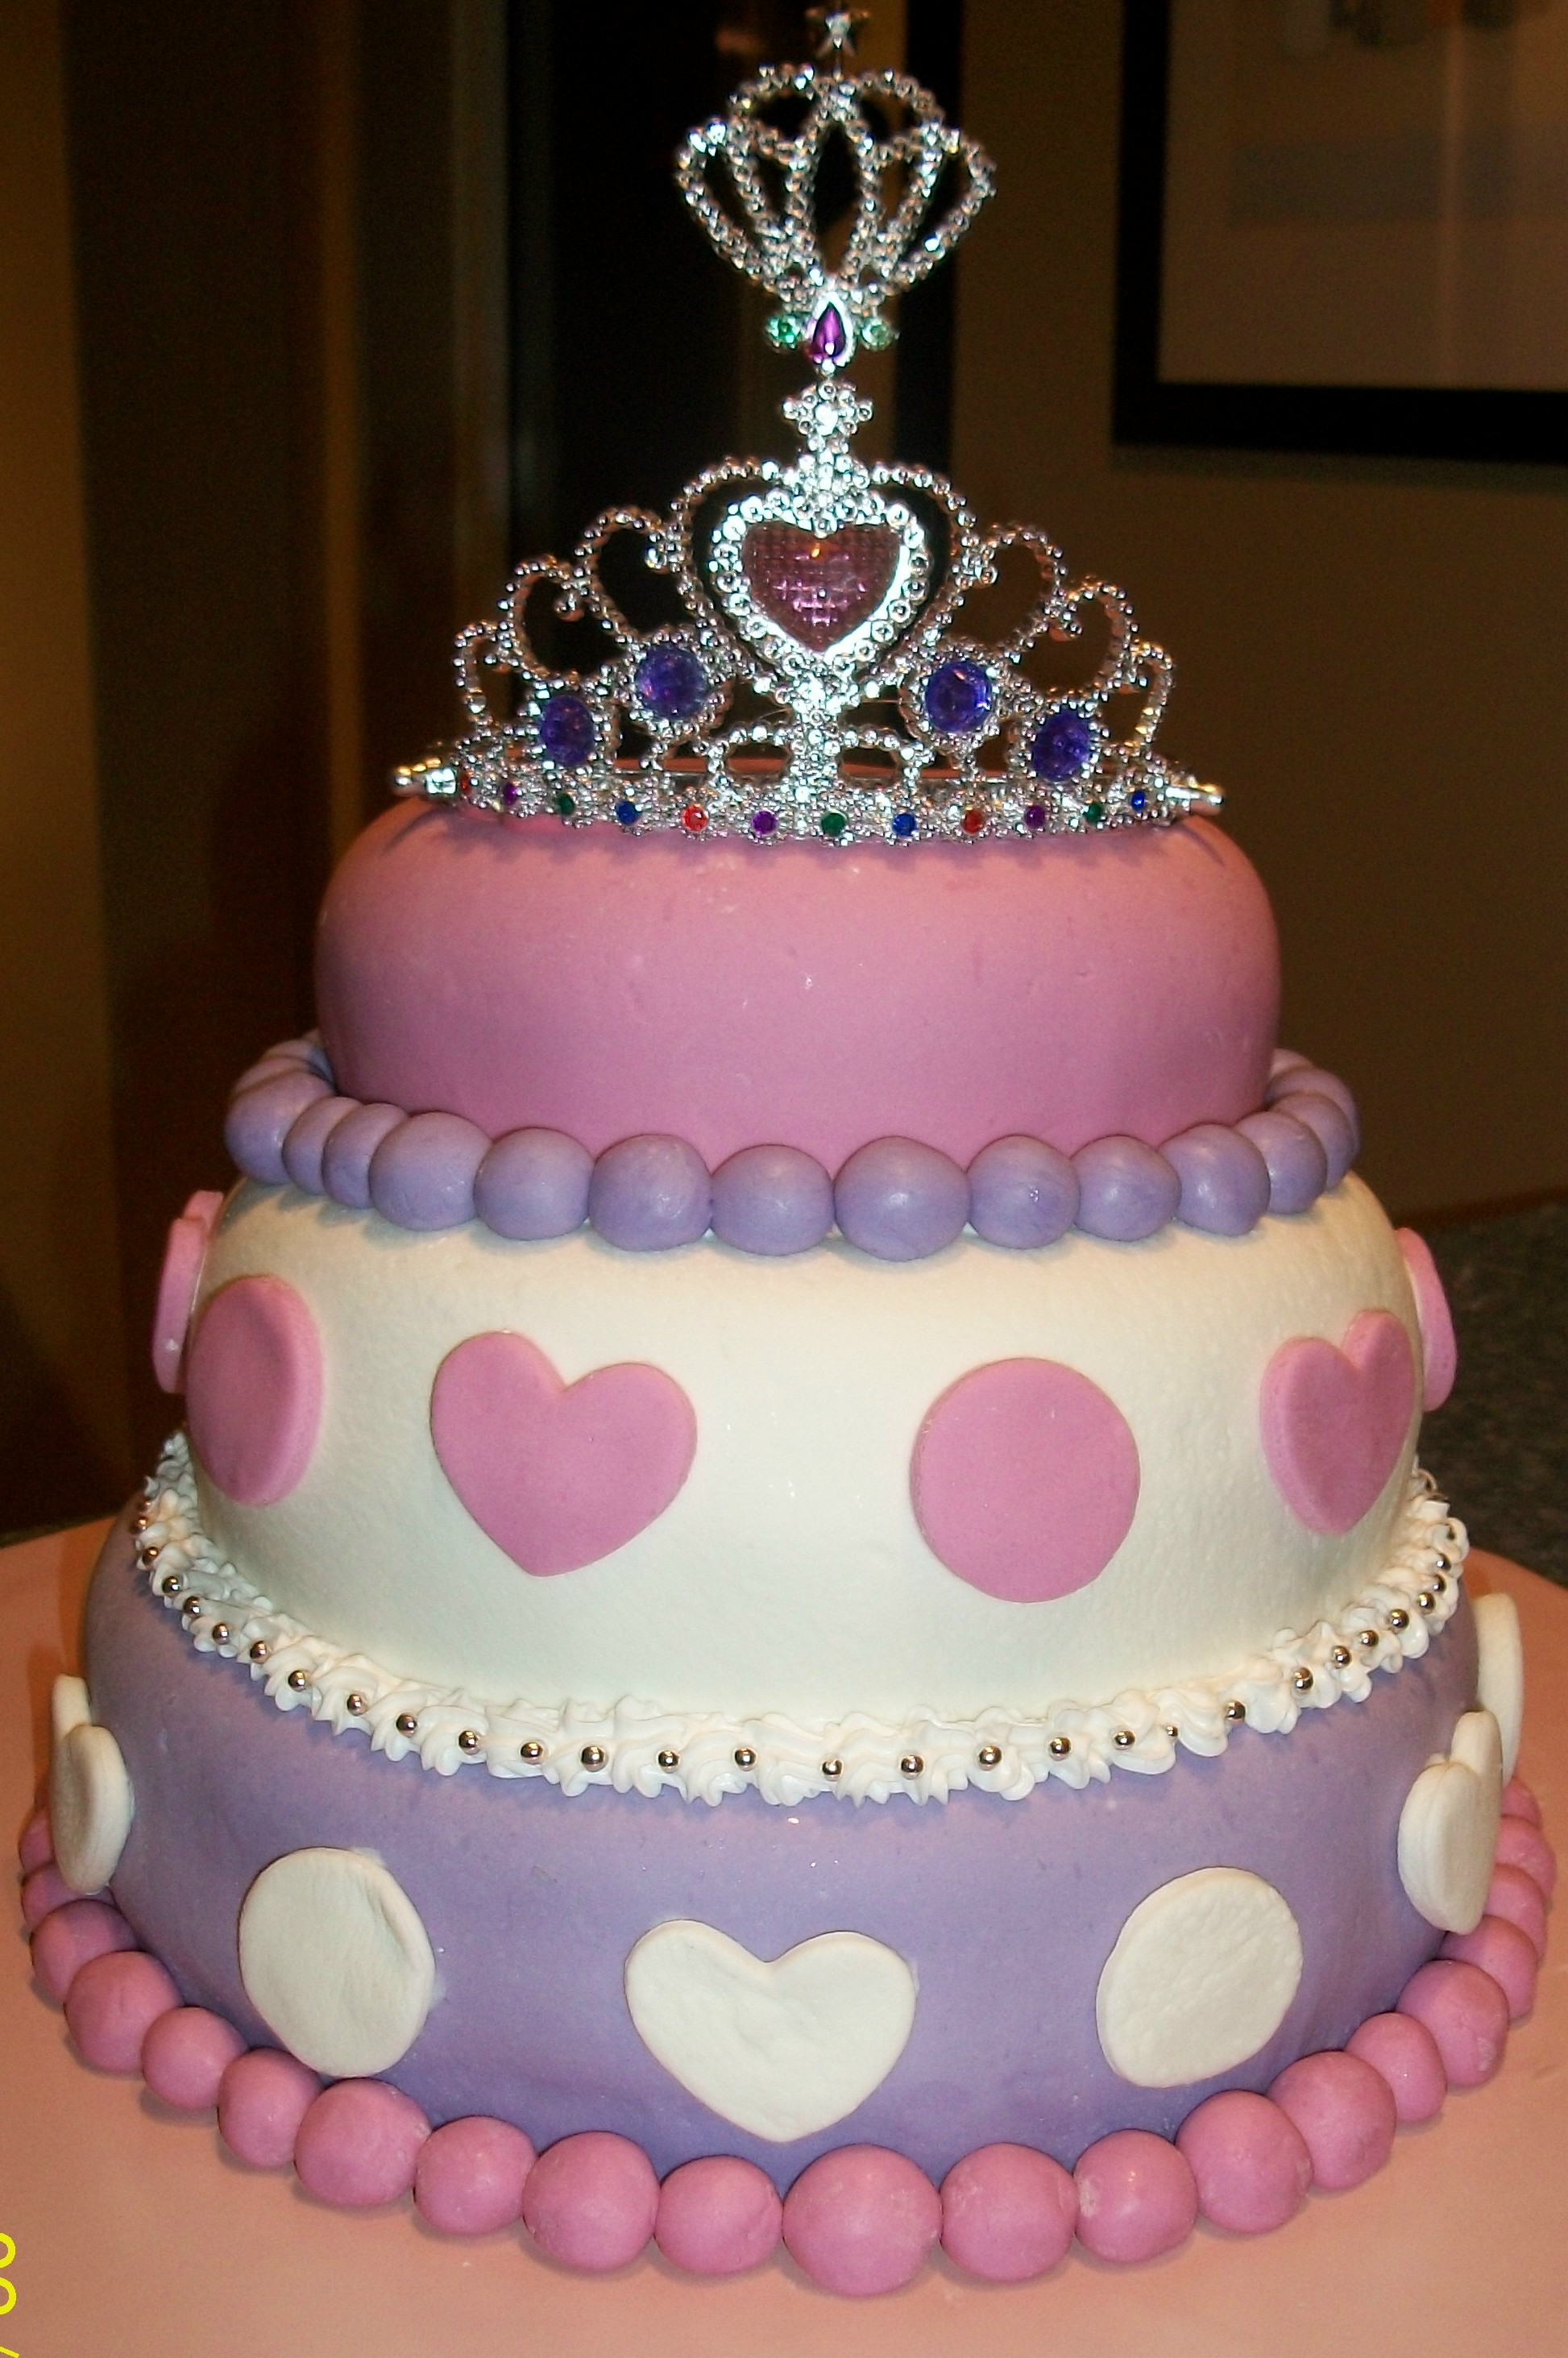 3 Year Old Girl Birthday Cake